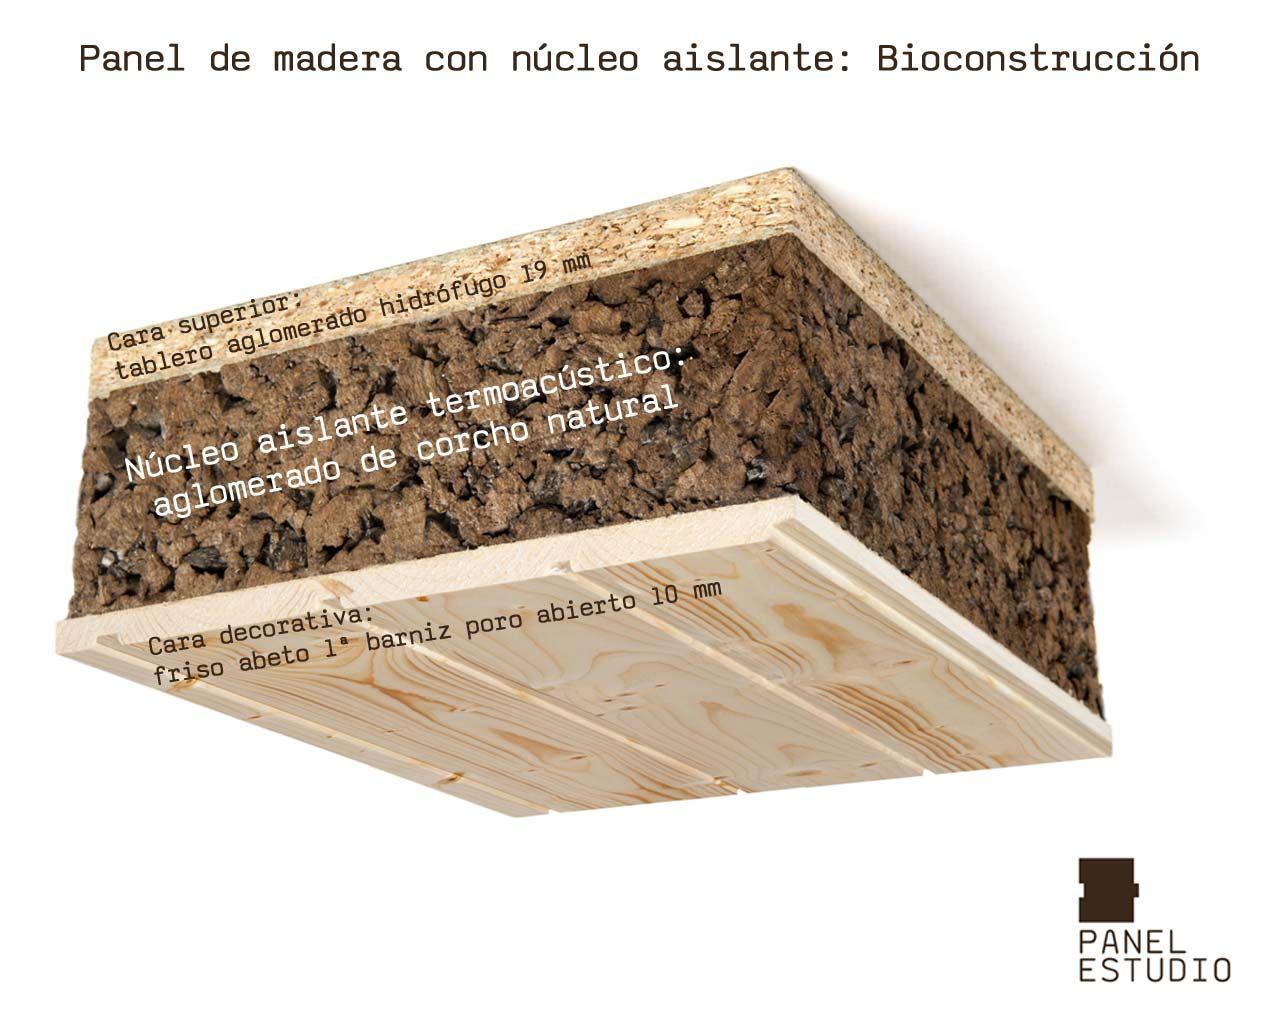 Tabiques madera con aislamiento acustico buscar con google arq tabique pinterest - Tabiques de madera ...